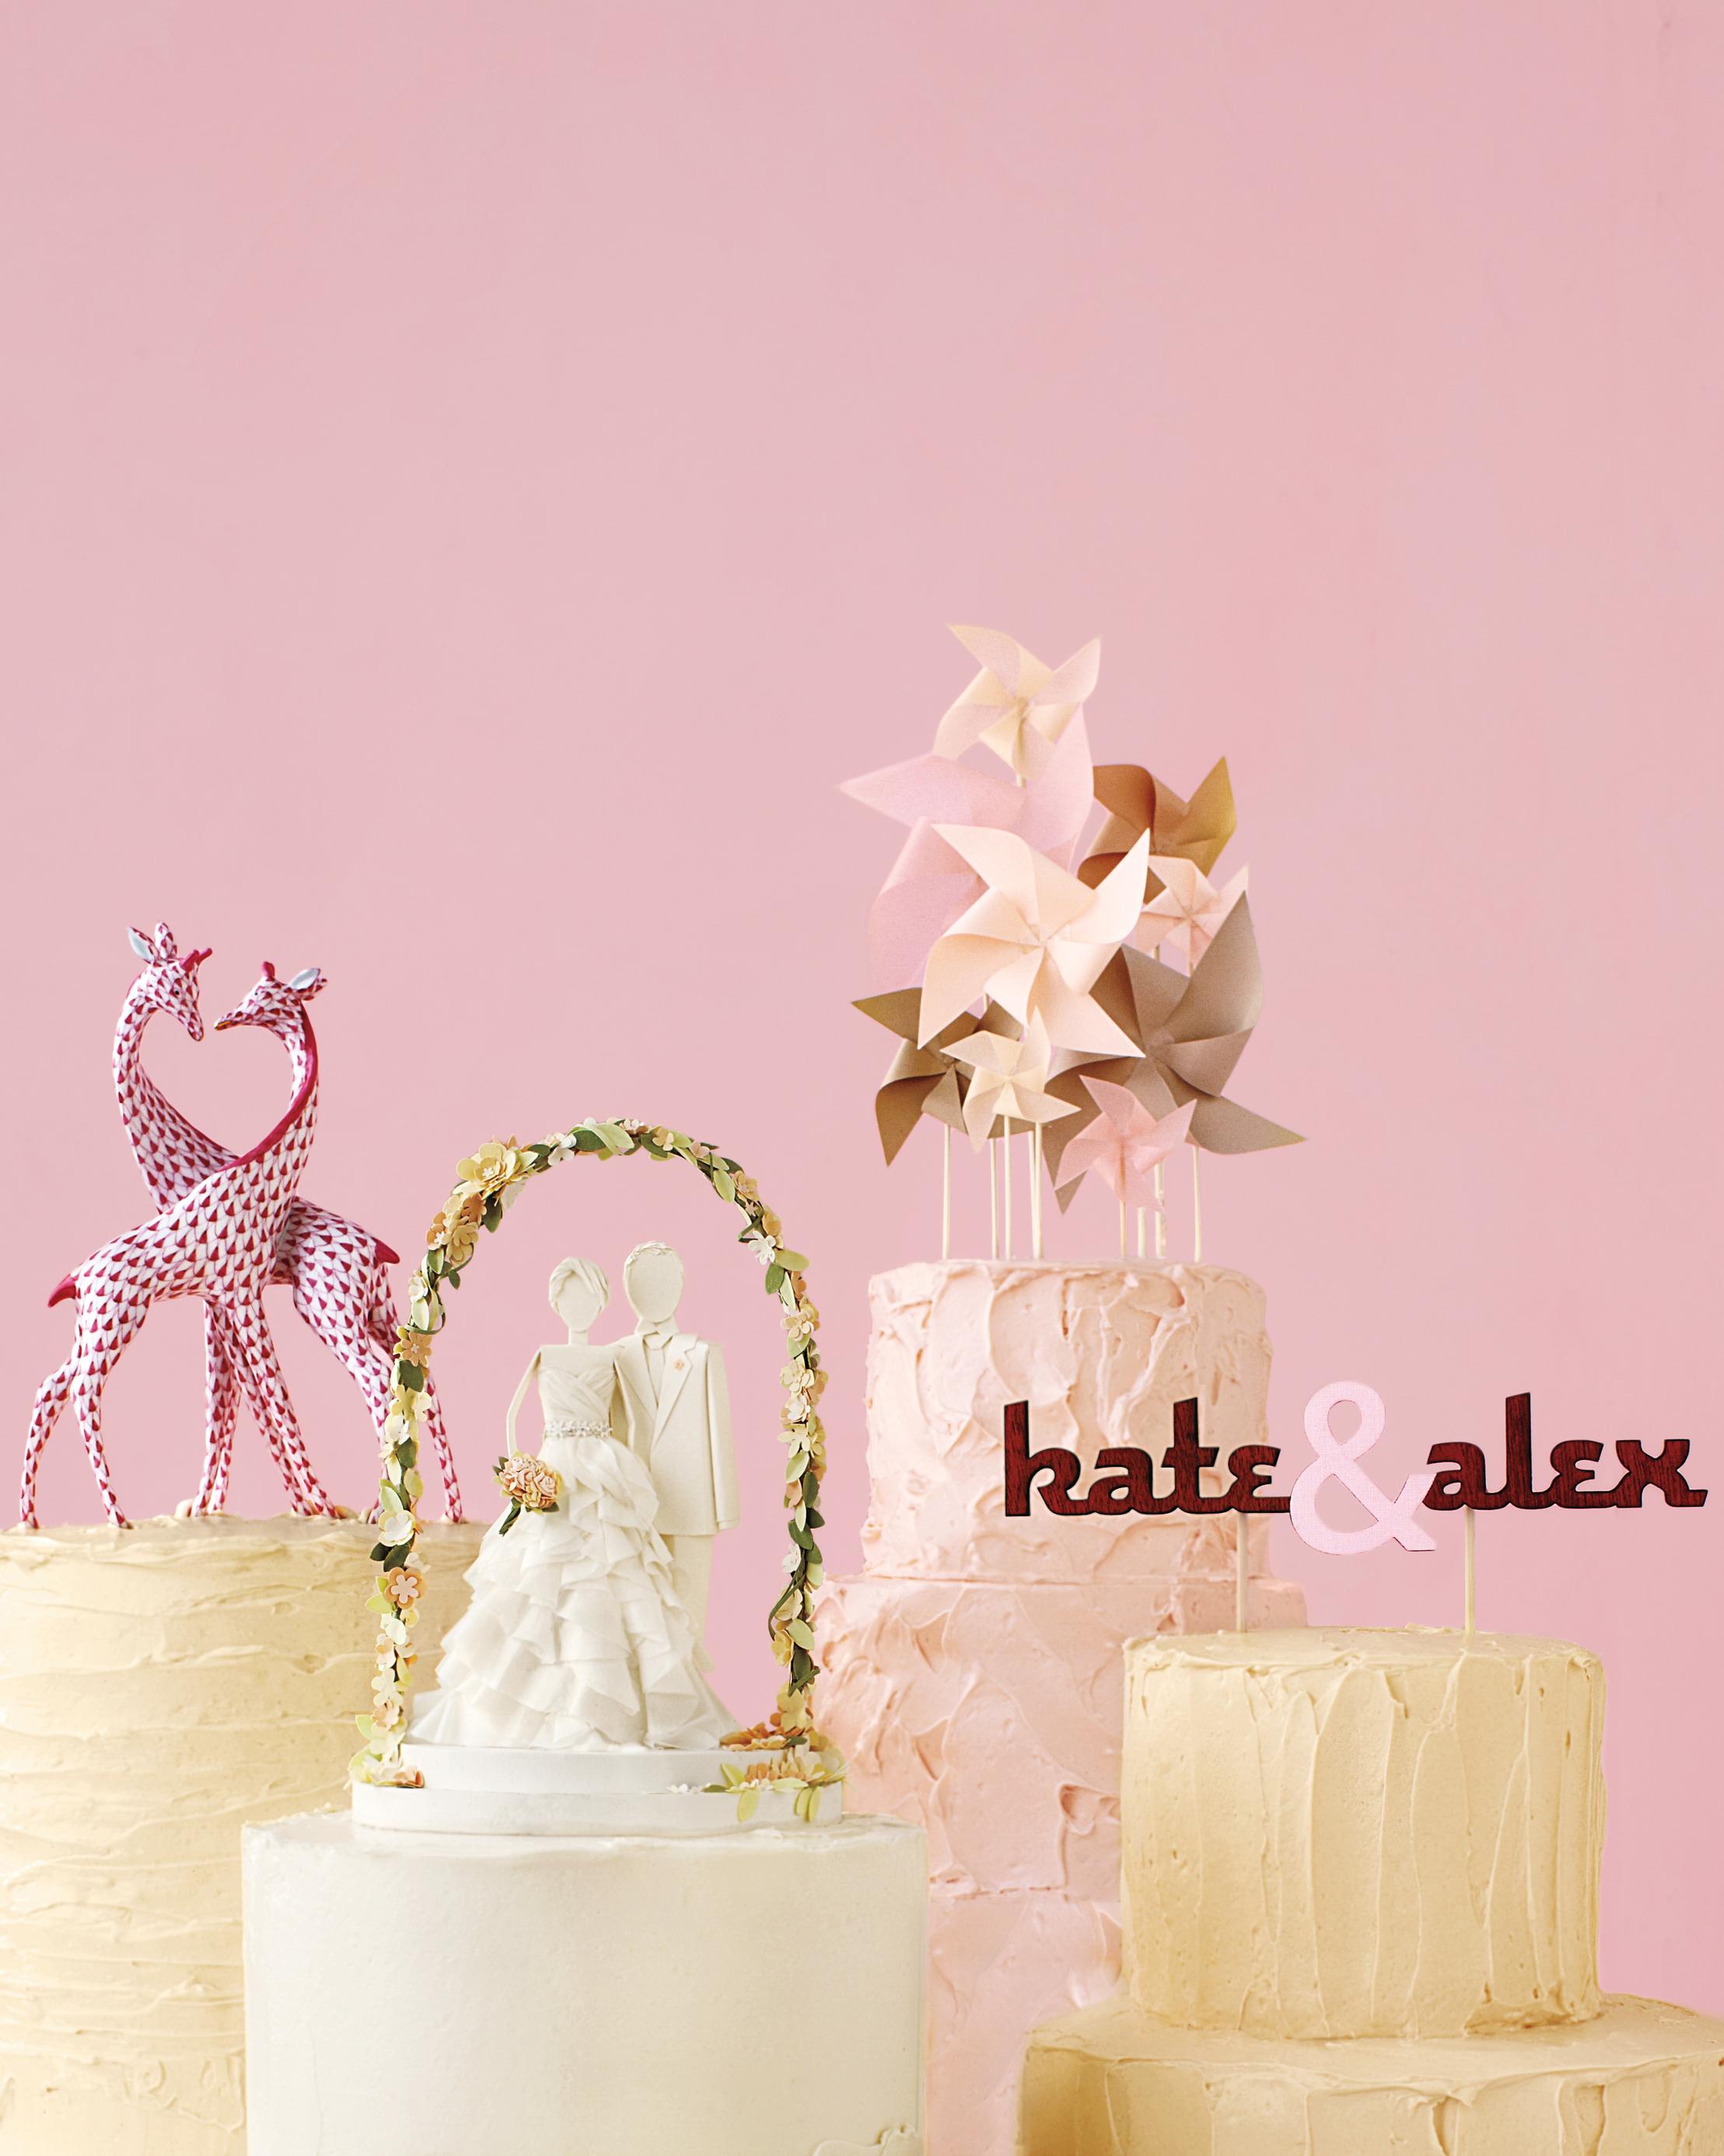 cake-toppers-mwd108461.jpg